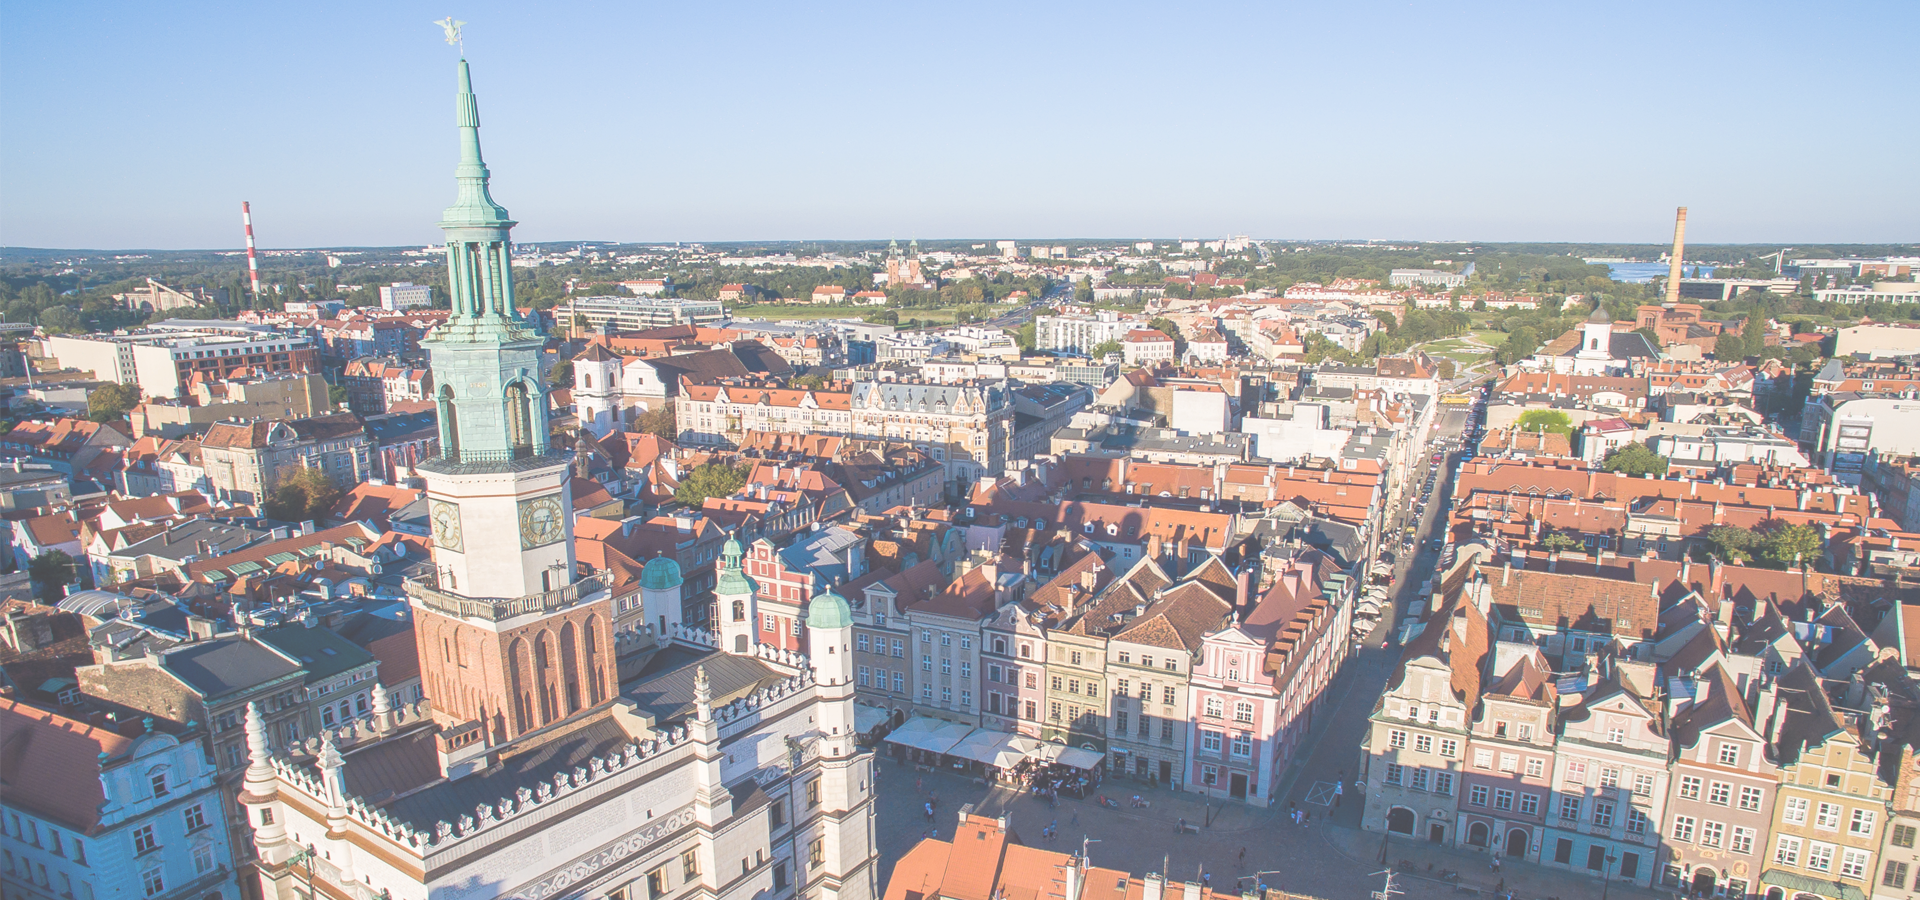 Peer-to-peer advisory in Poznań, Greater Poland, Poland